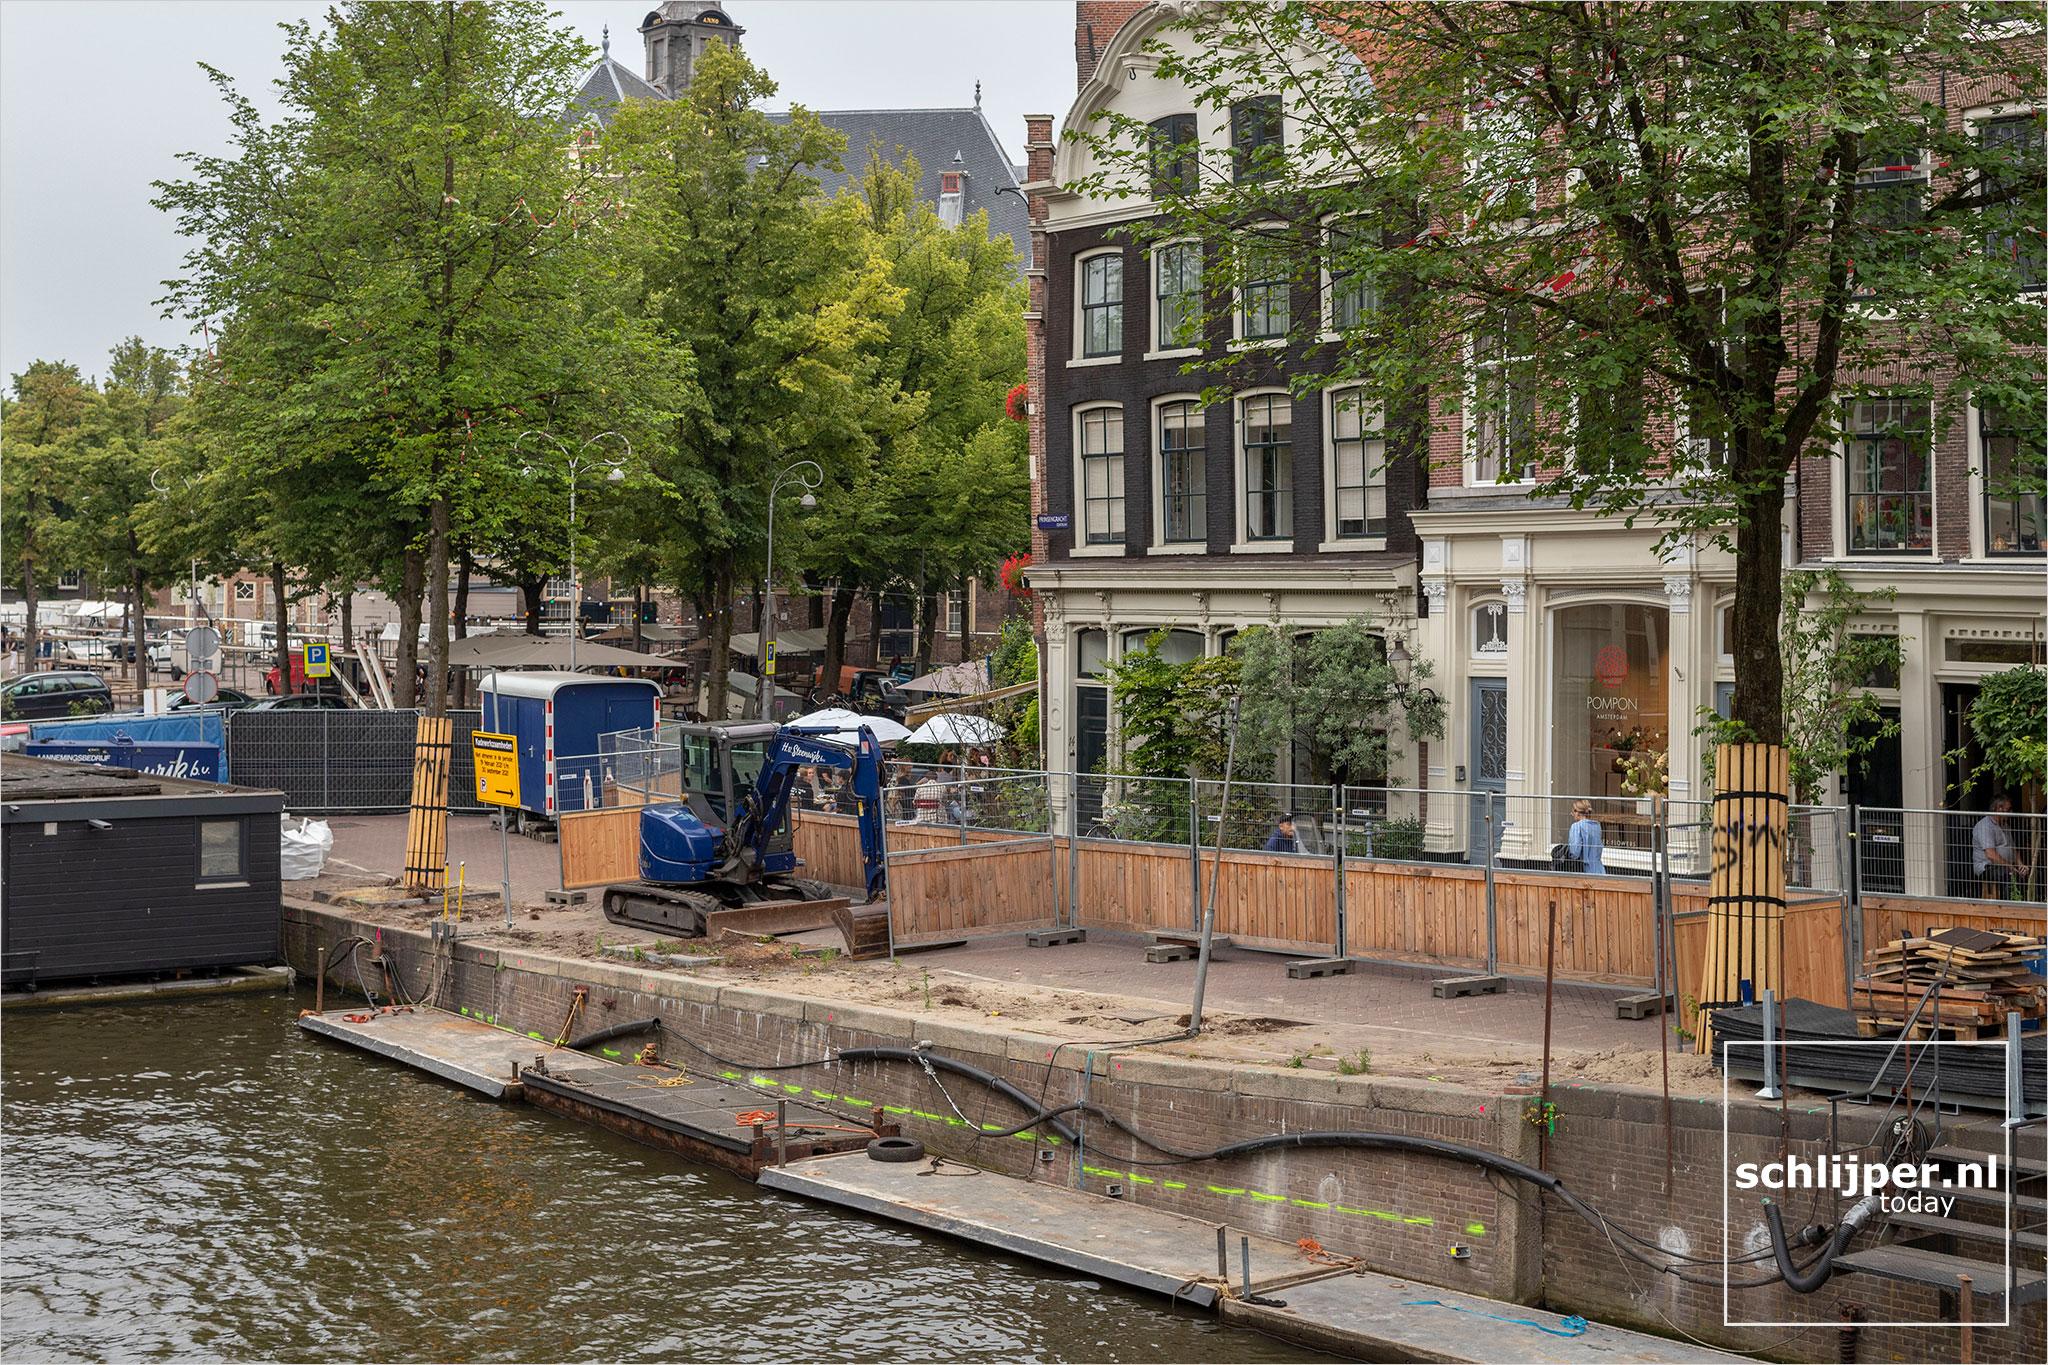 The Netherlands, Amsterdam, 24 juli 2021